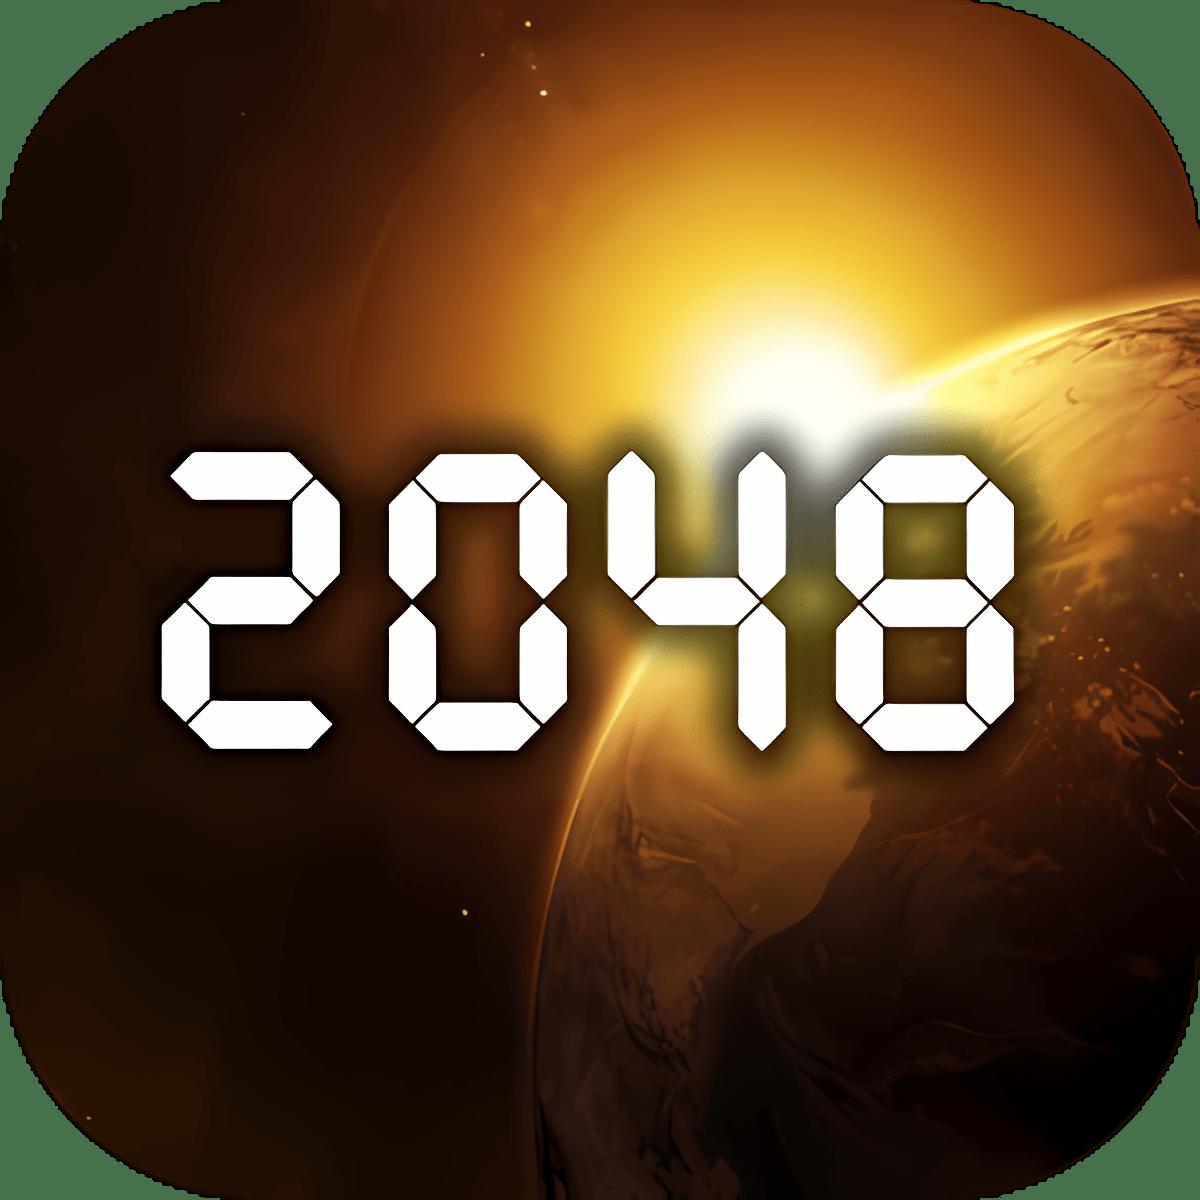 2048 X-Treme